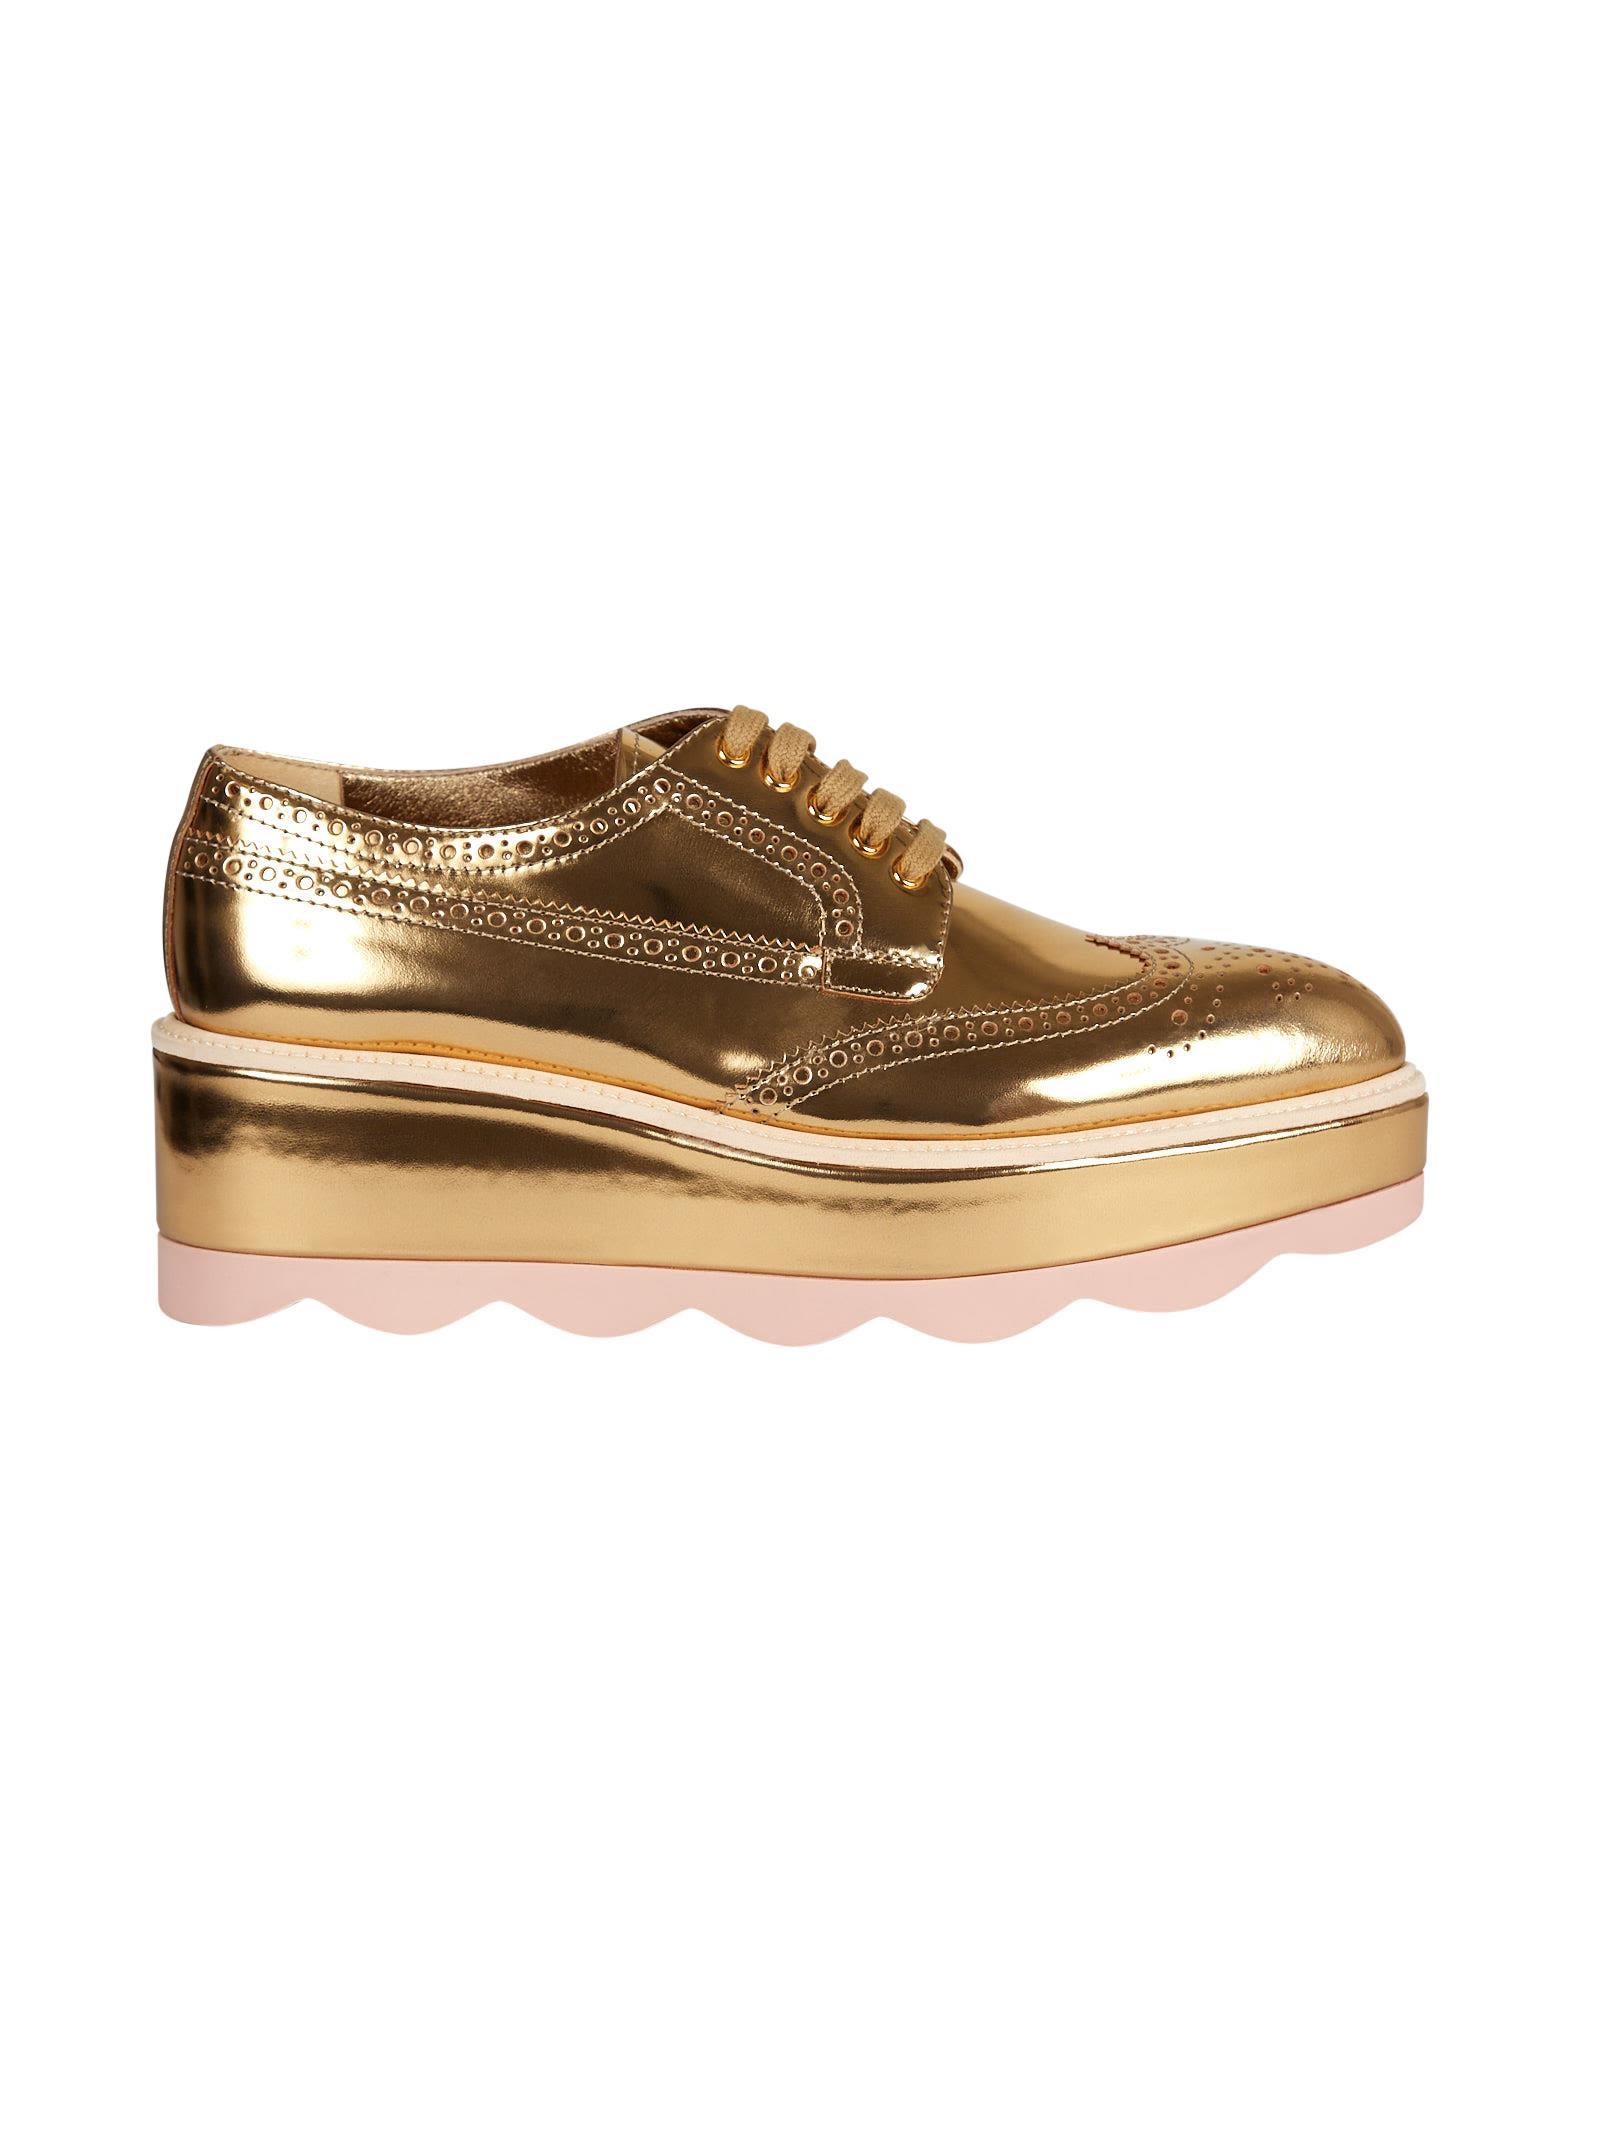 Prada High Oxford Shoes